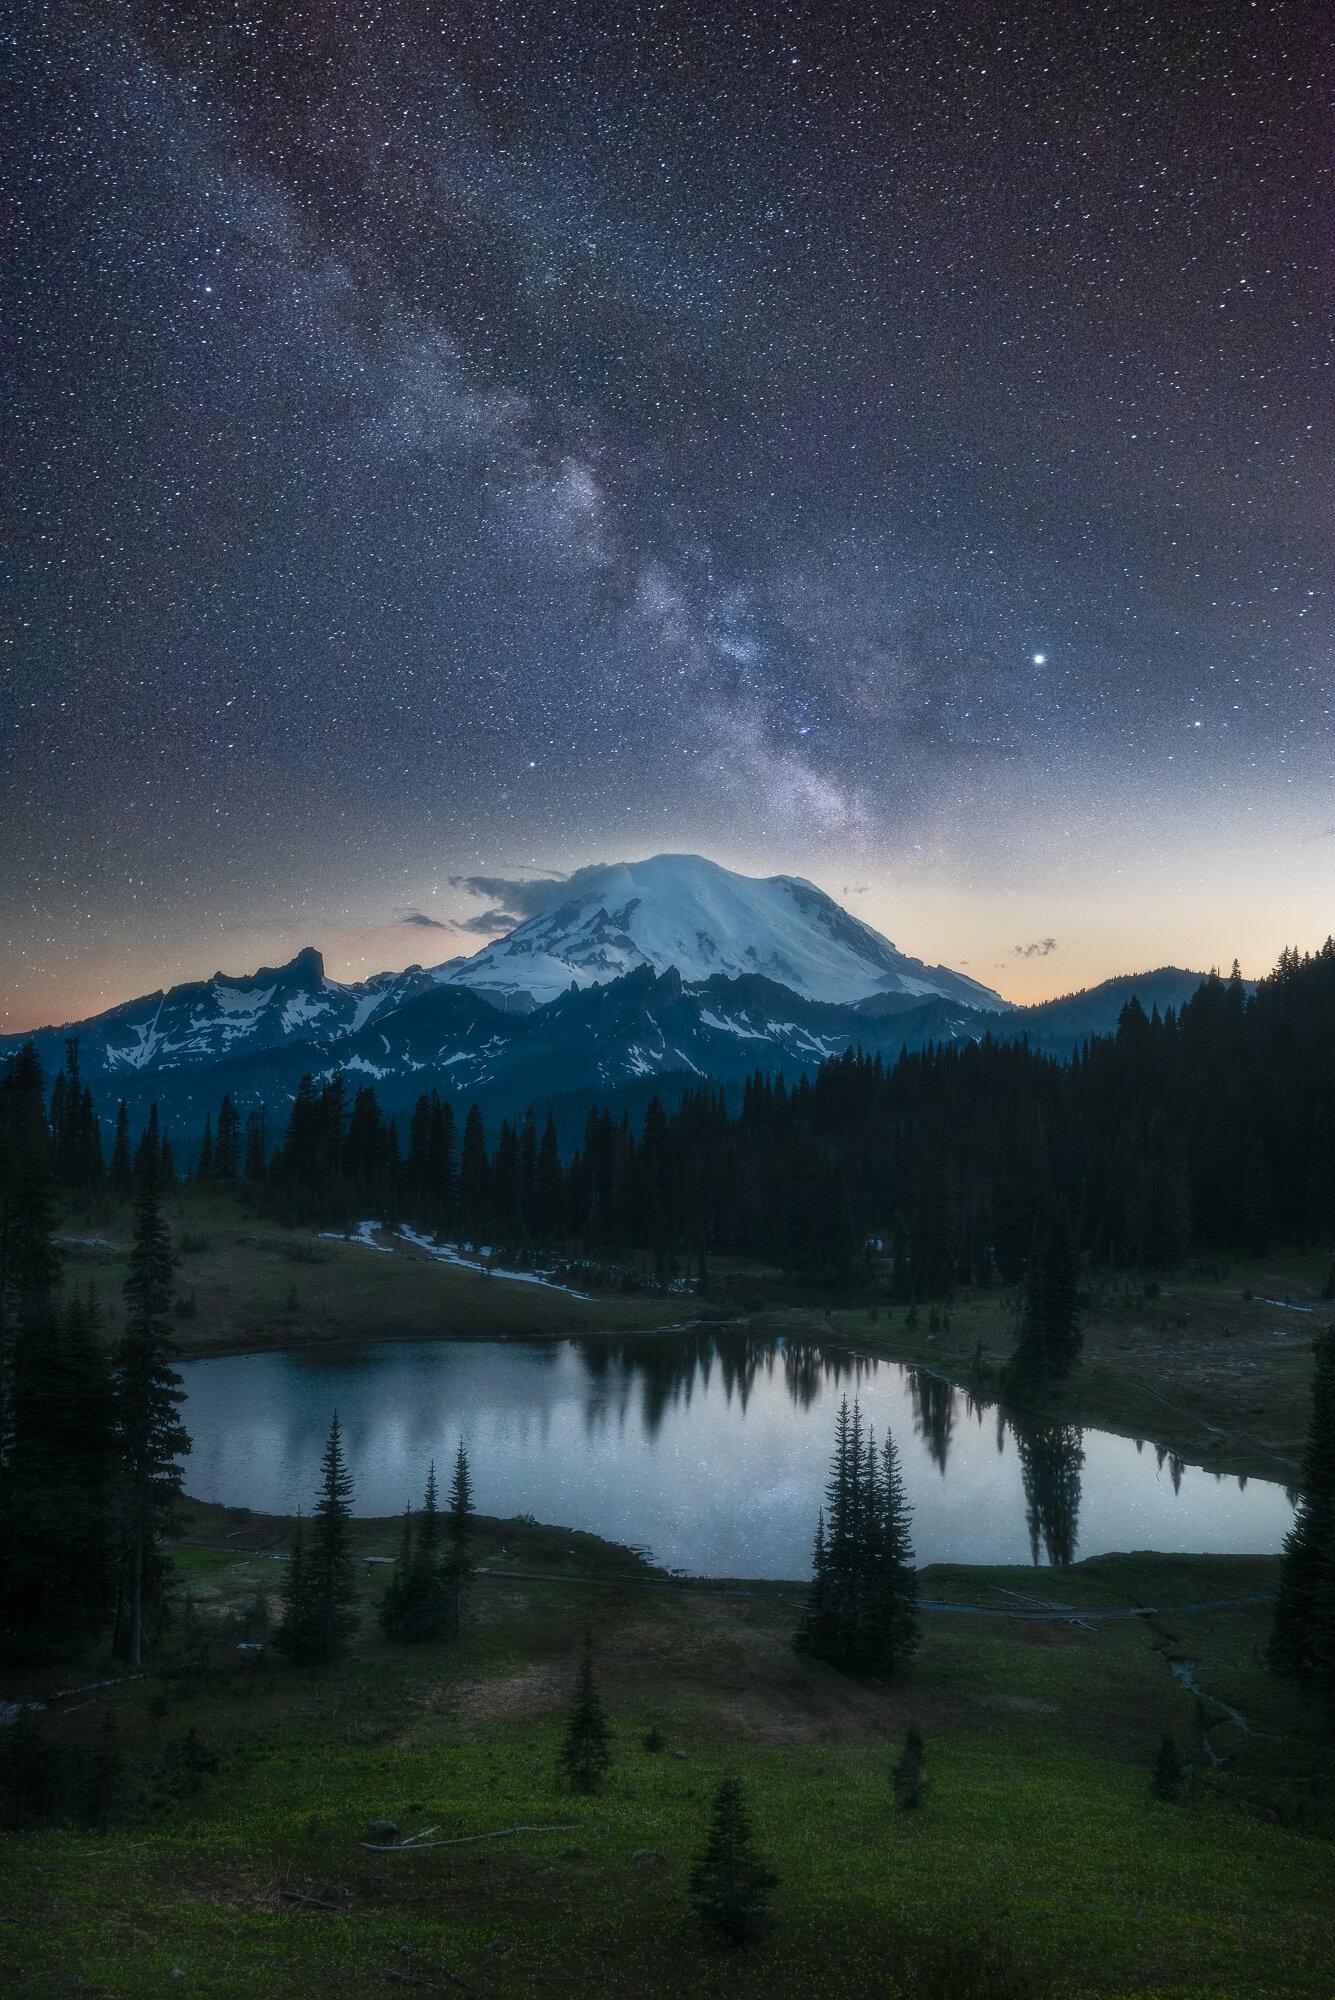 Mount Rainier Photography: 'Rainier Under Starlight'